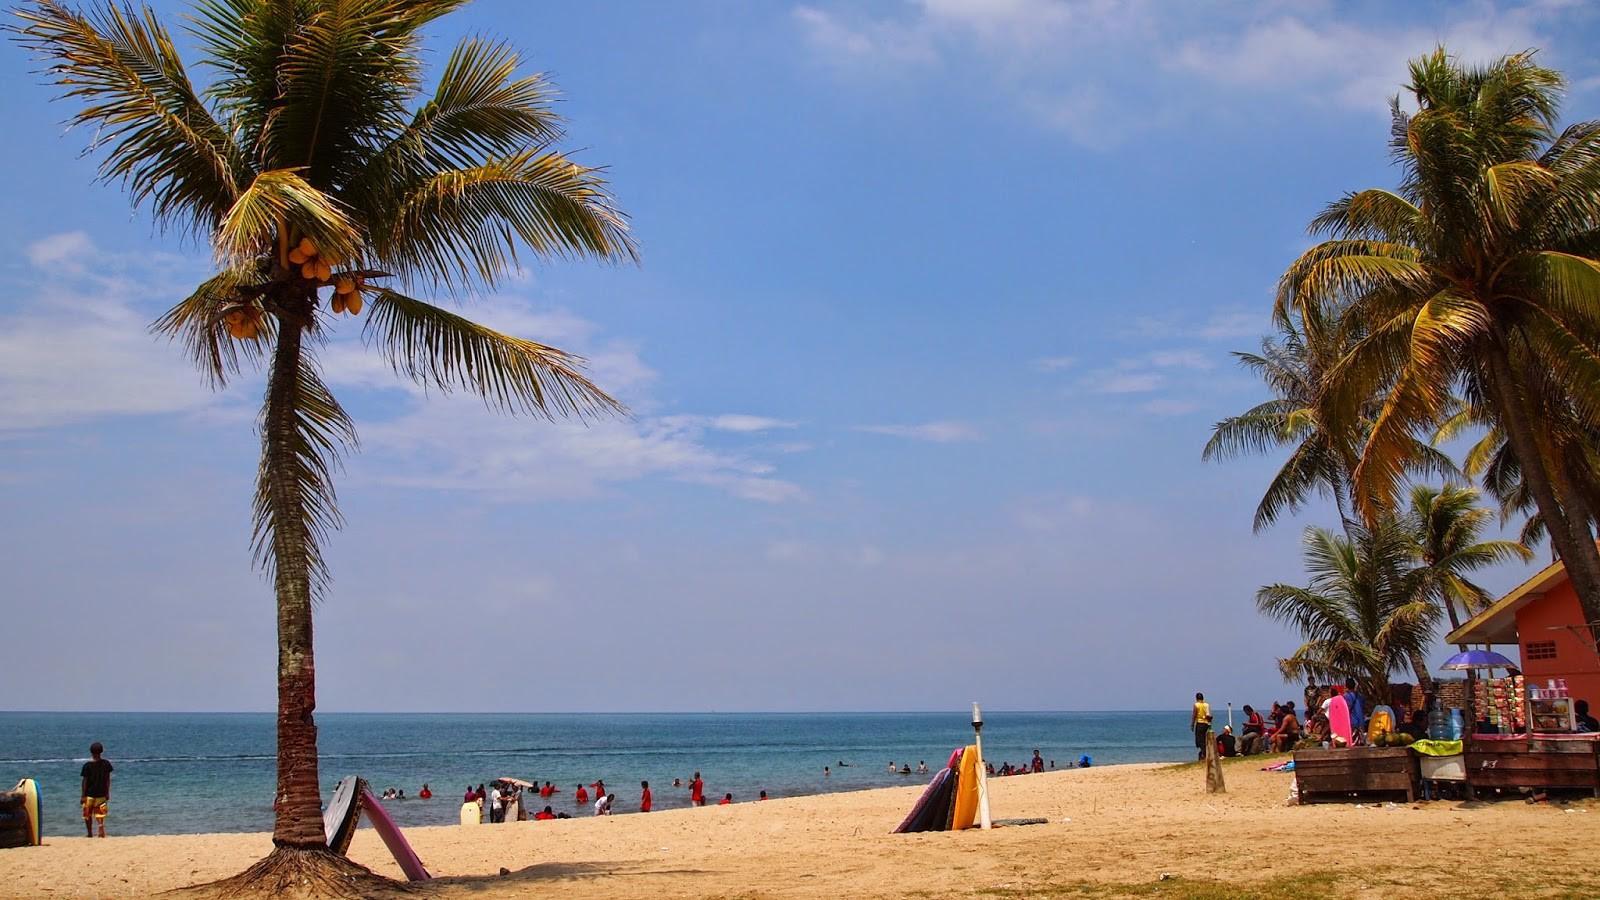 Daftar Harga Paket Wisata Anyer Murah Risqa Ardyansyah Medium Pantai